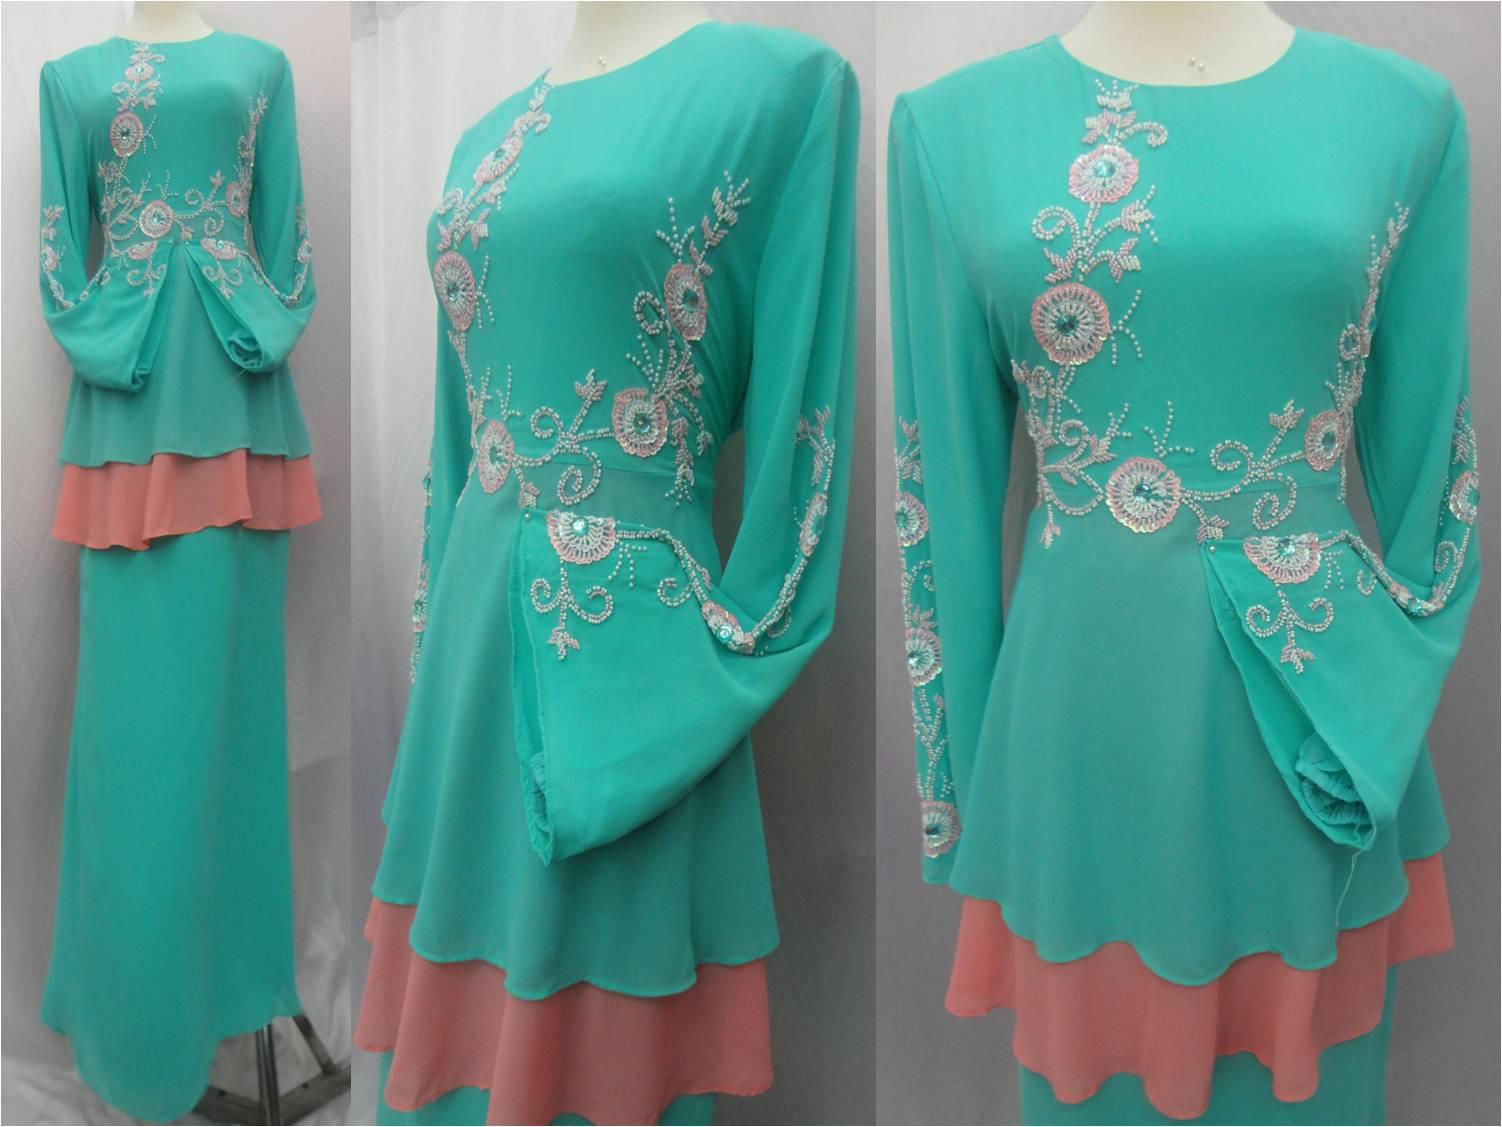 Fesyen Baju Jubah Dan Tudung Terbaru Raya Aidiladha 2013 2015